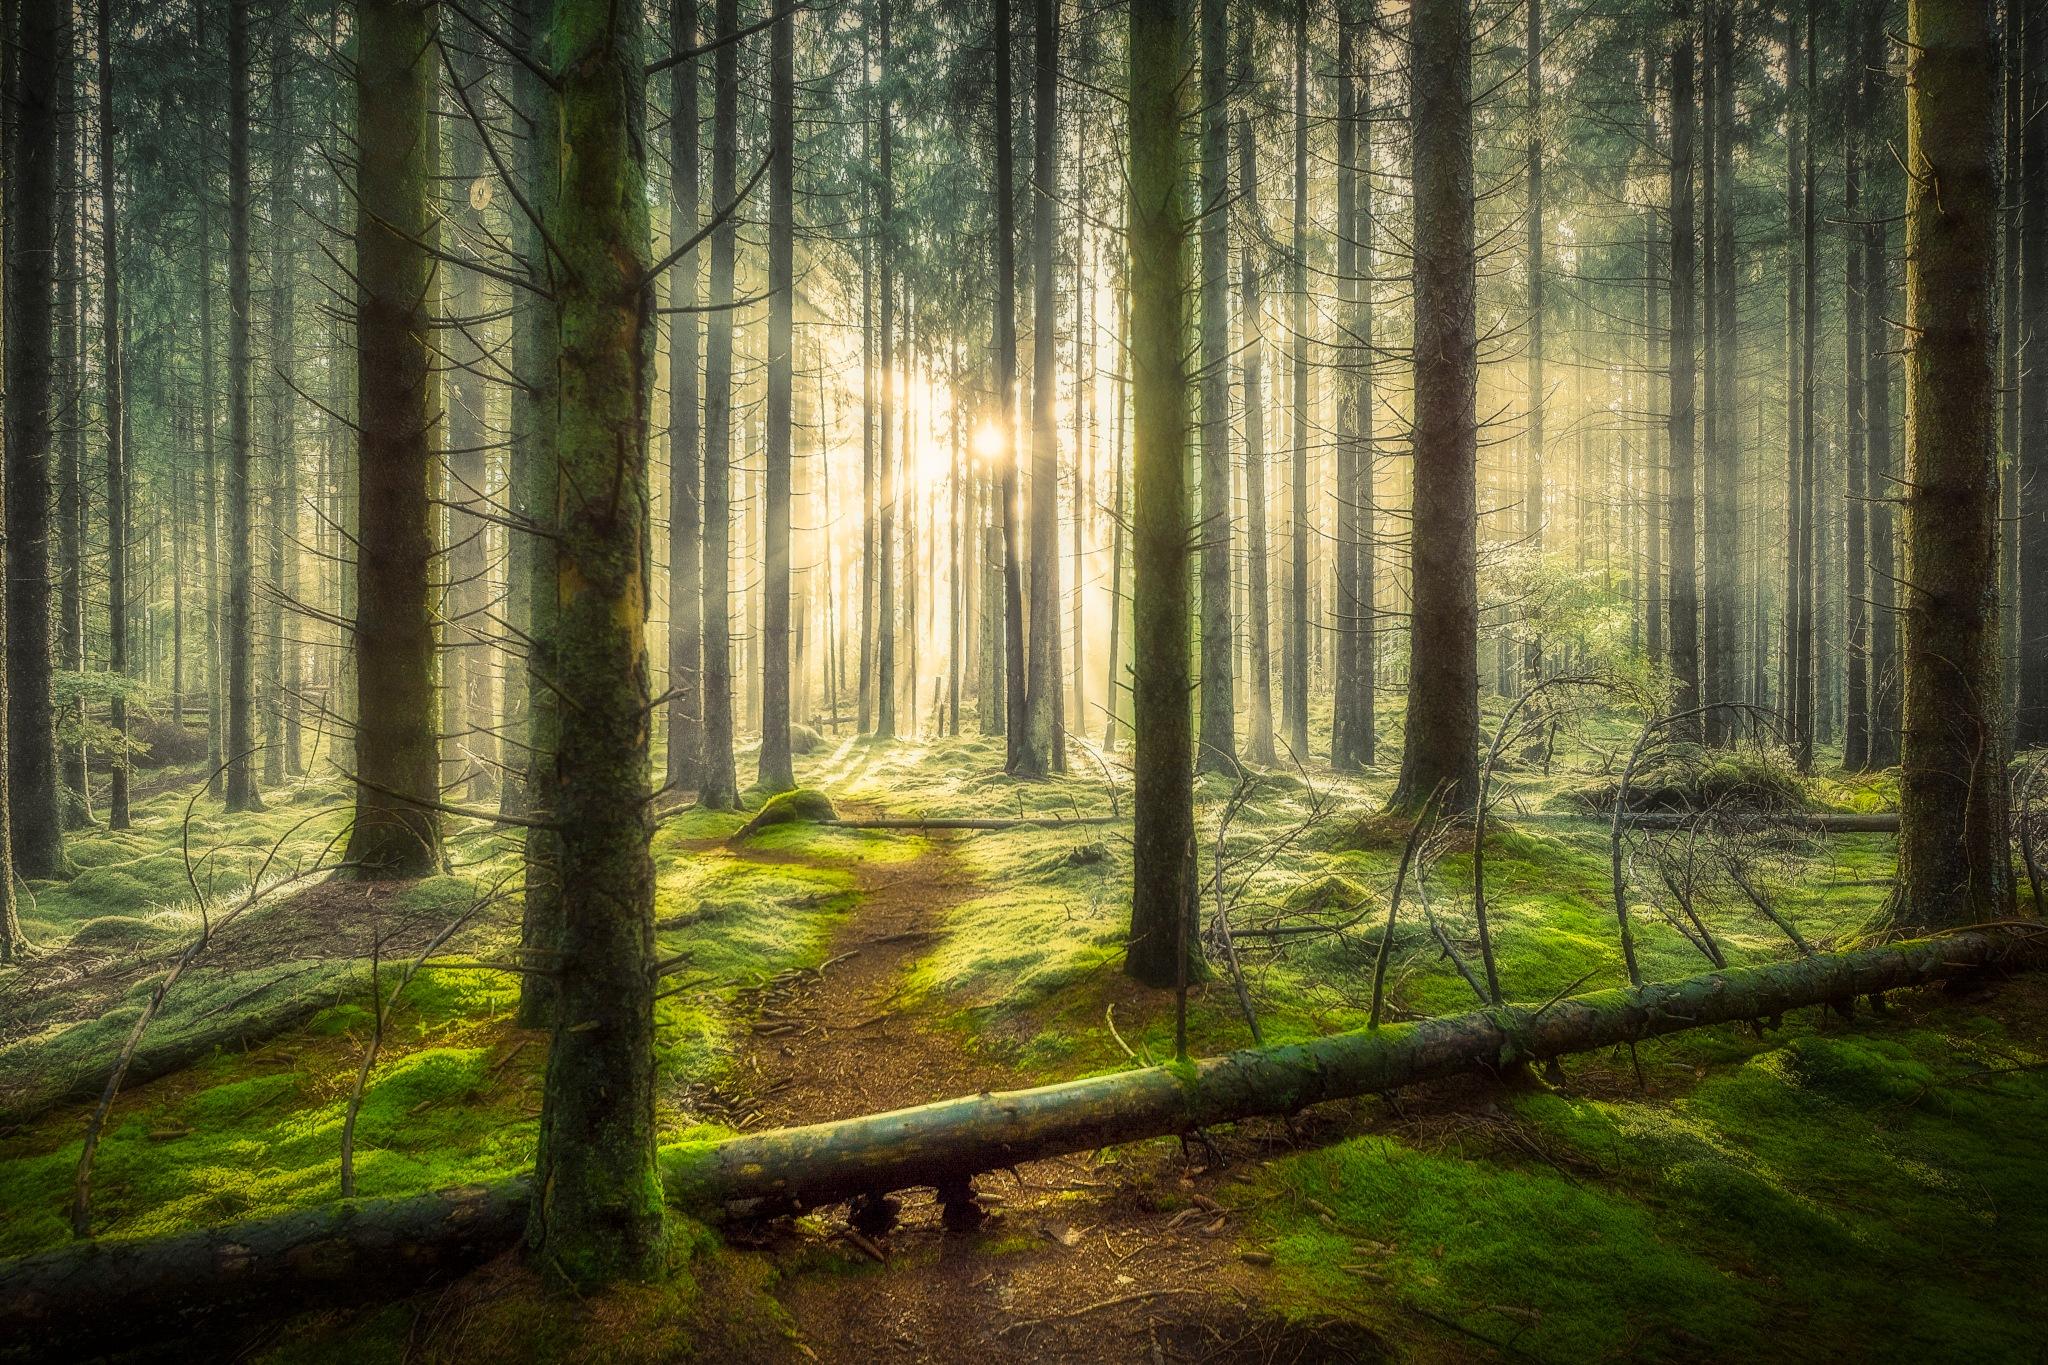 Magcial woodlands by Göran Ebenhart